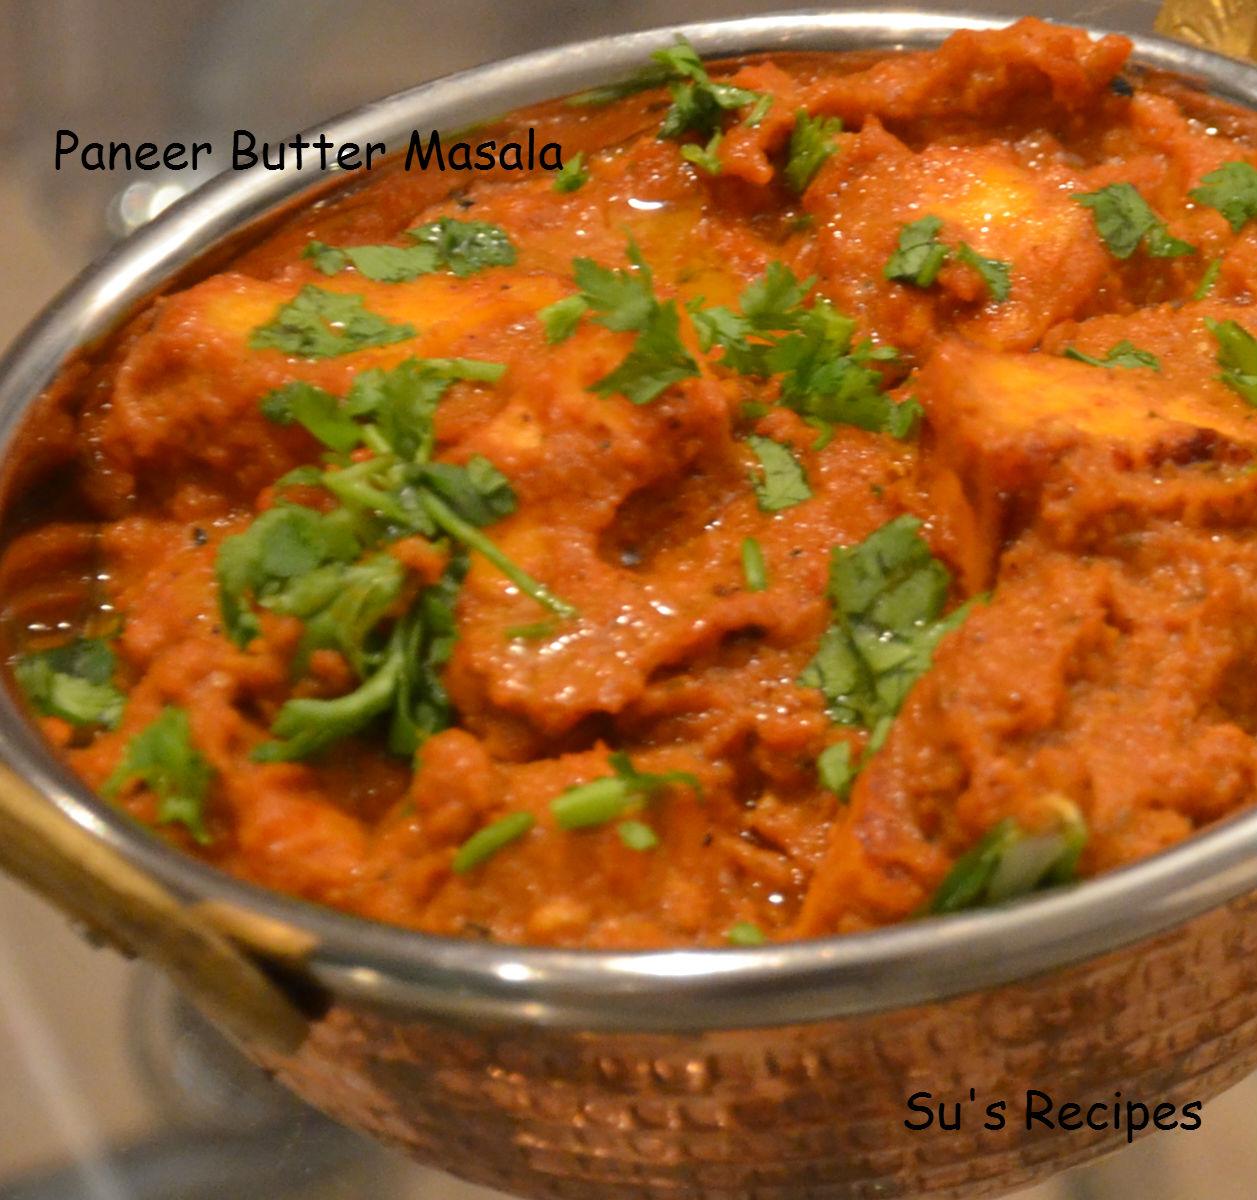 Su's Recipes: Paneer Butter Masala